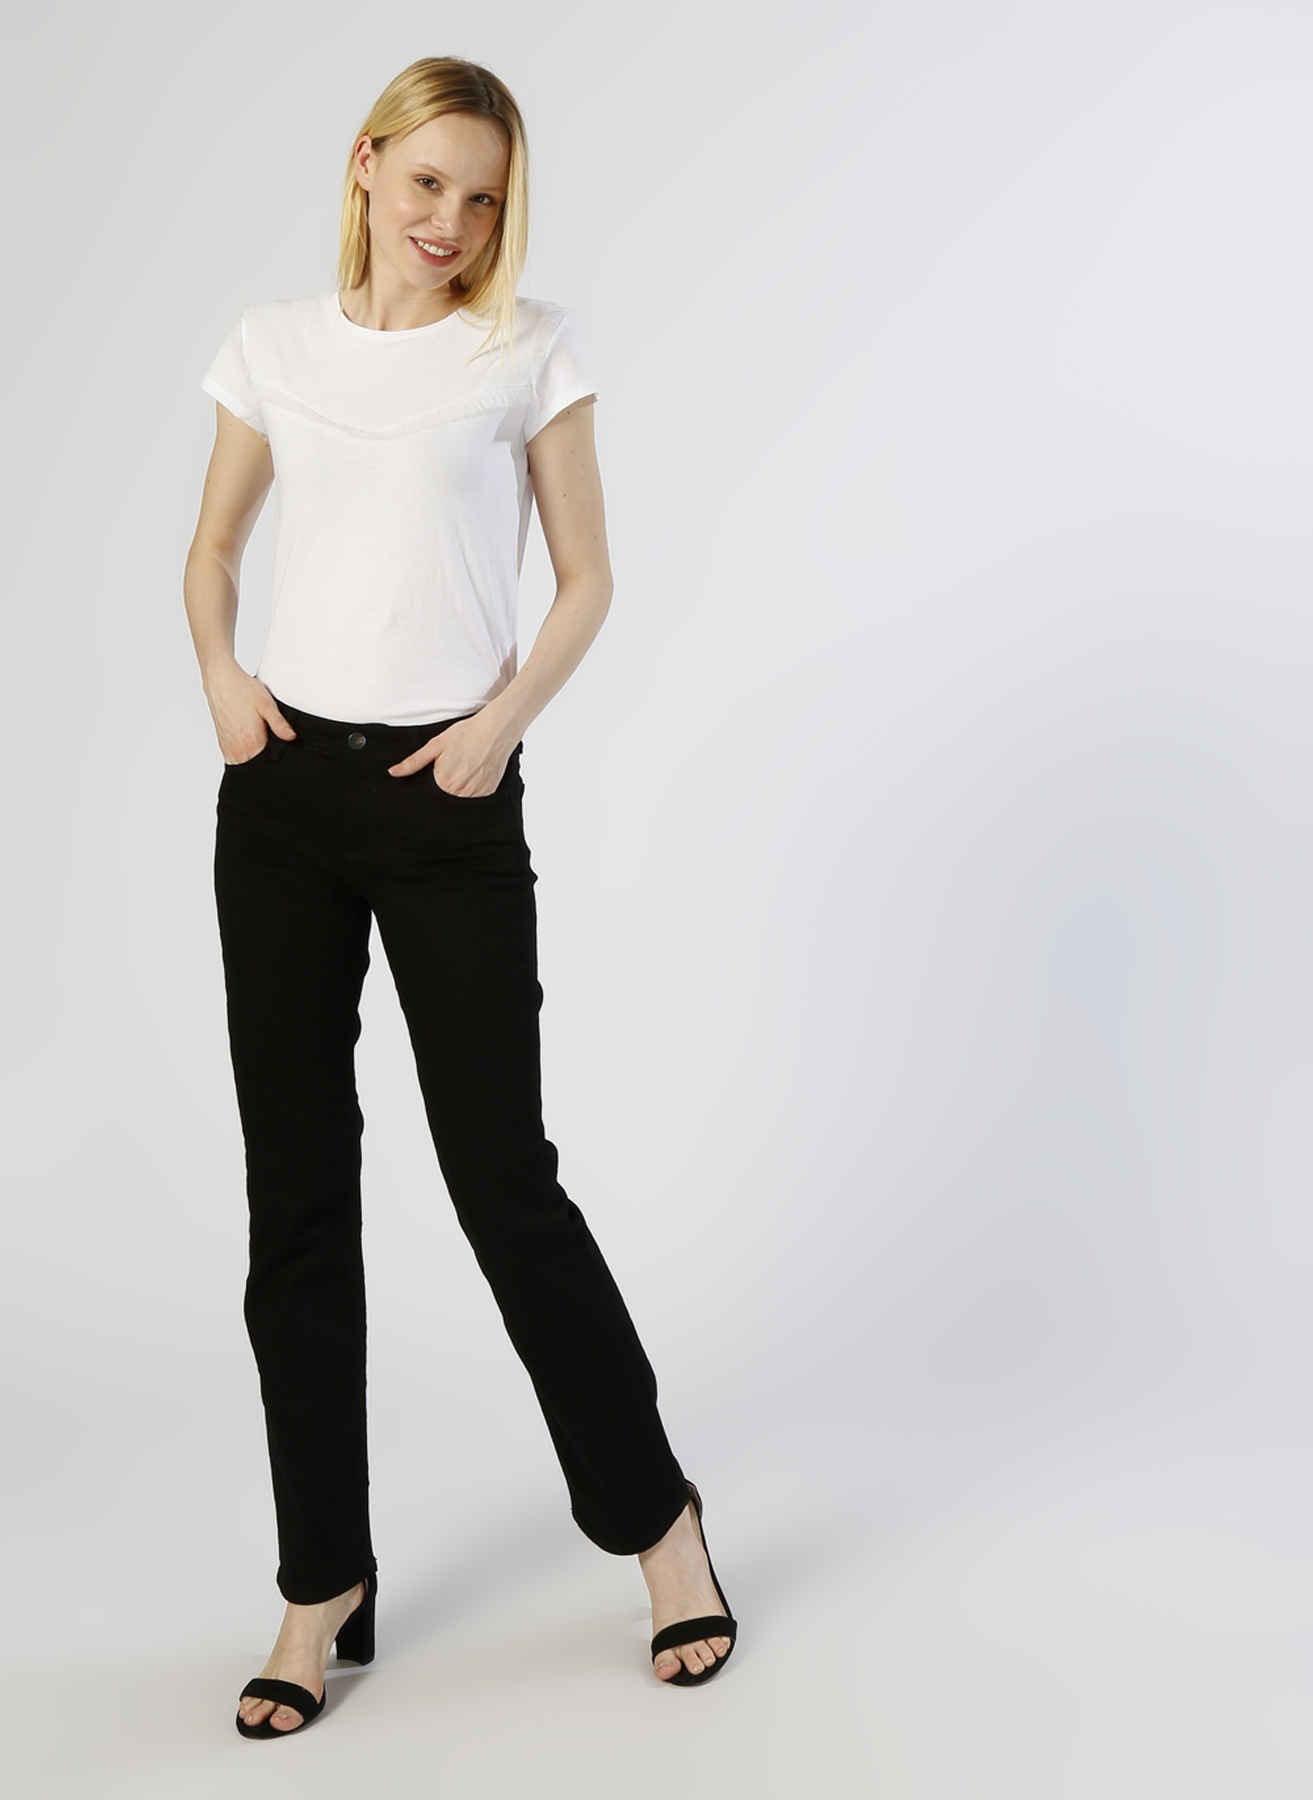 Loft Slim Fit Siyah Denim Pantolon 31-32 5000224877013 Ürün Resmi